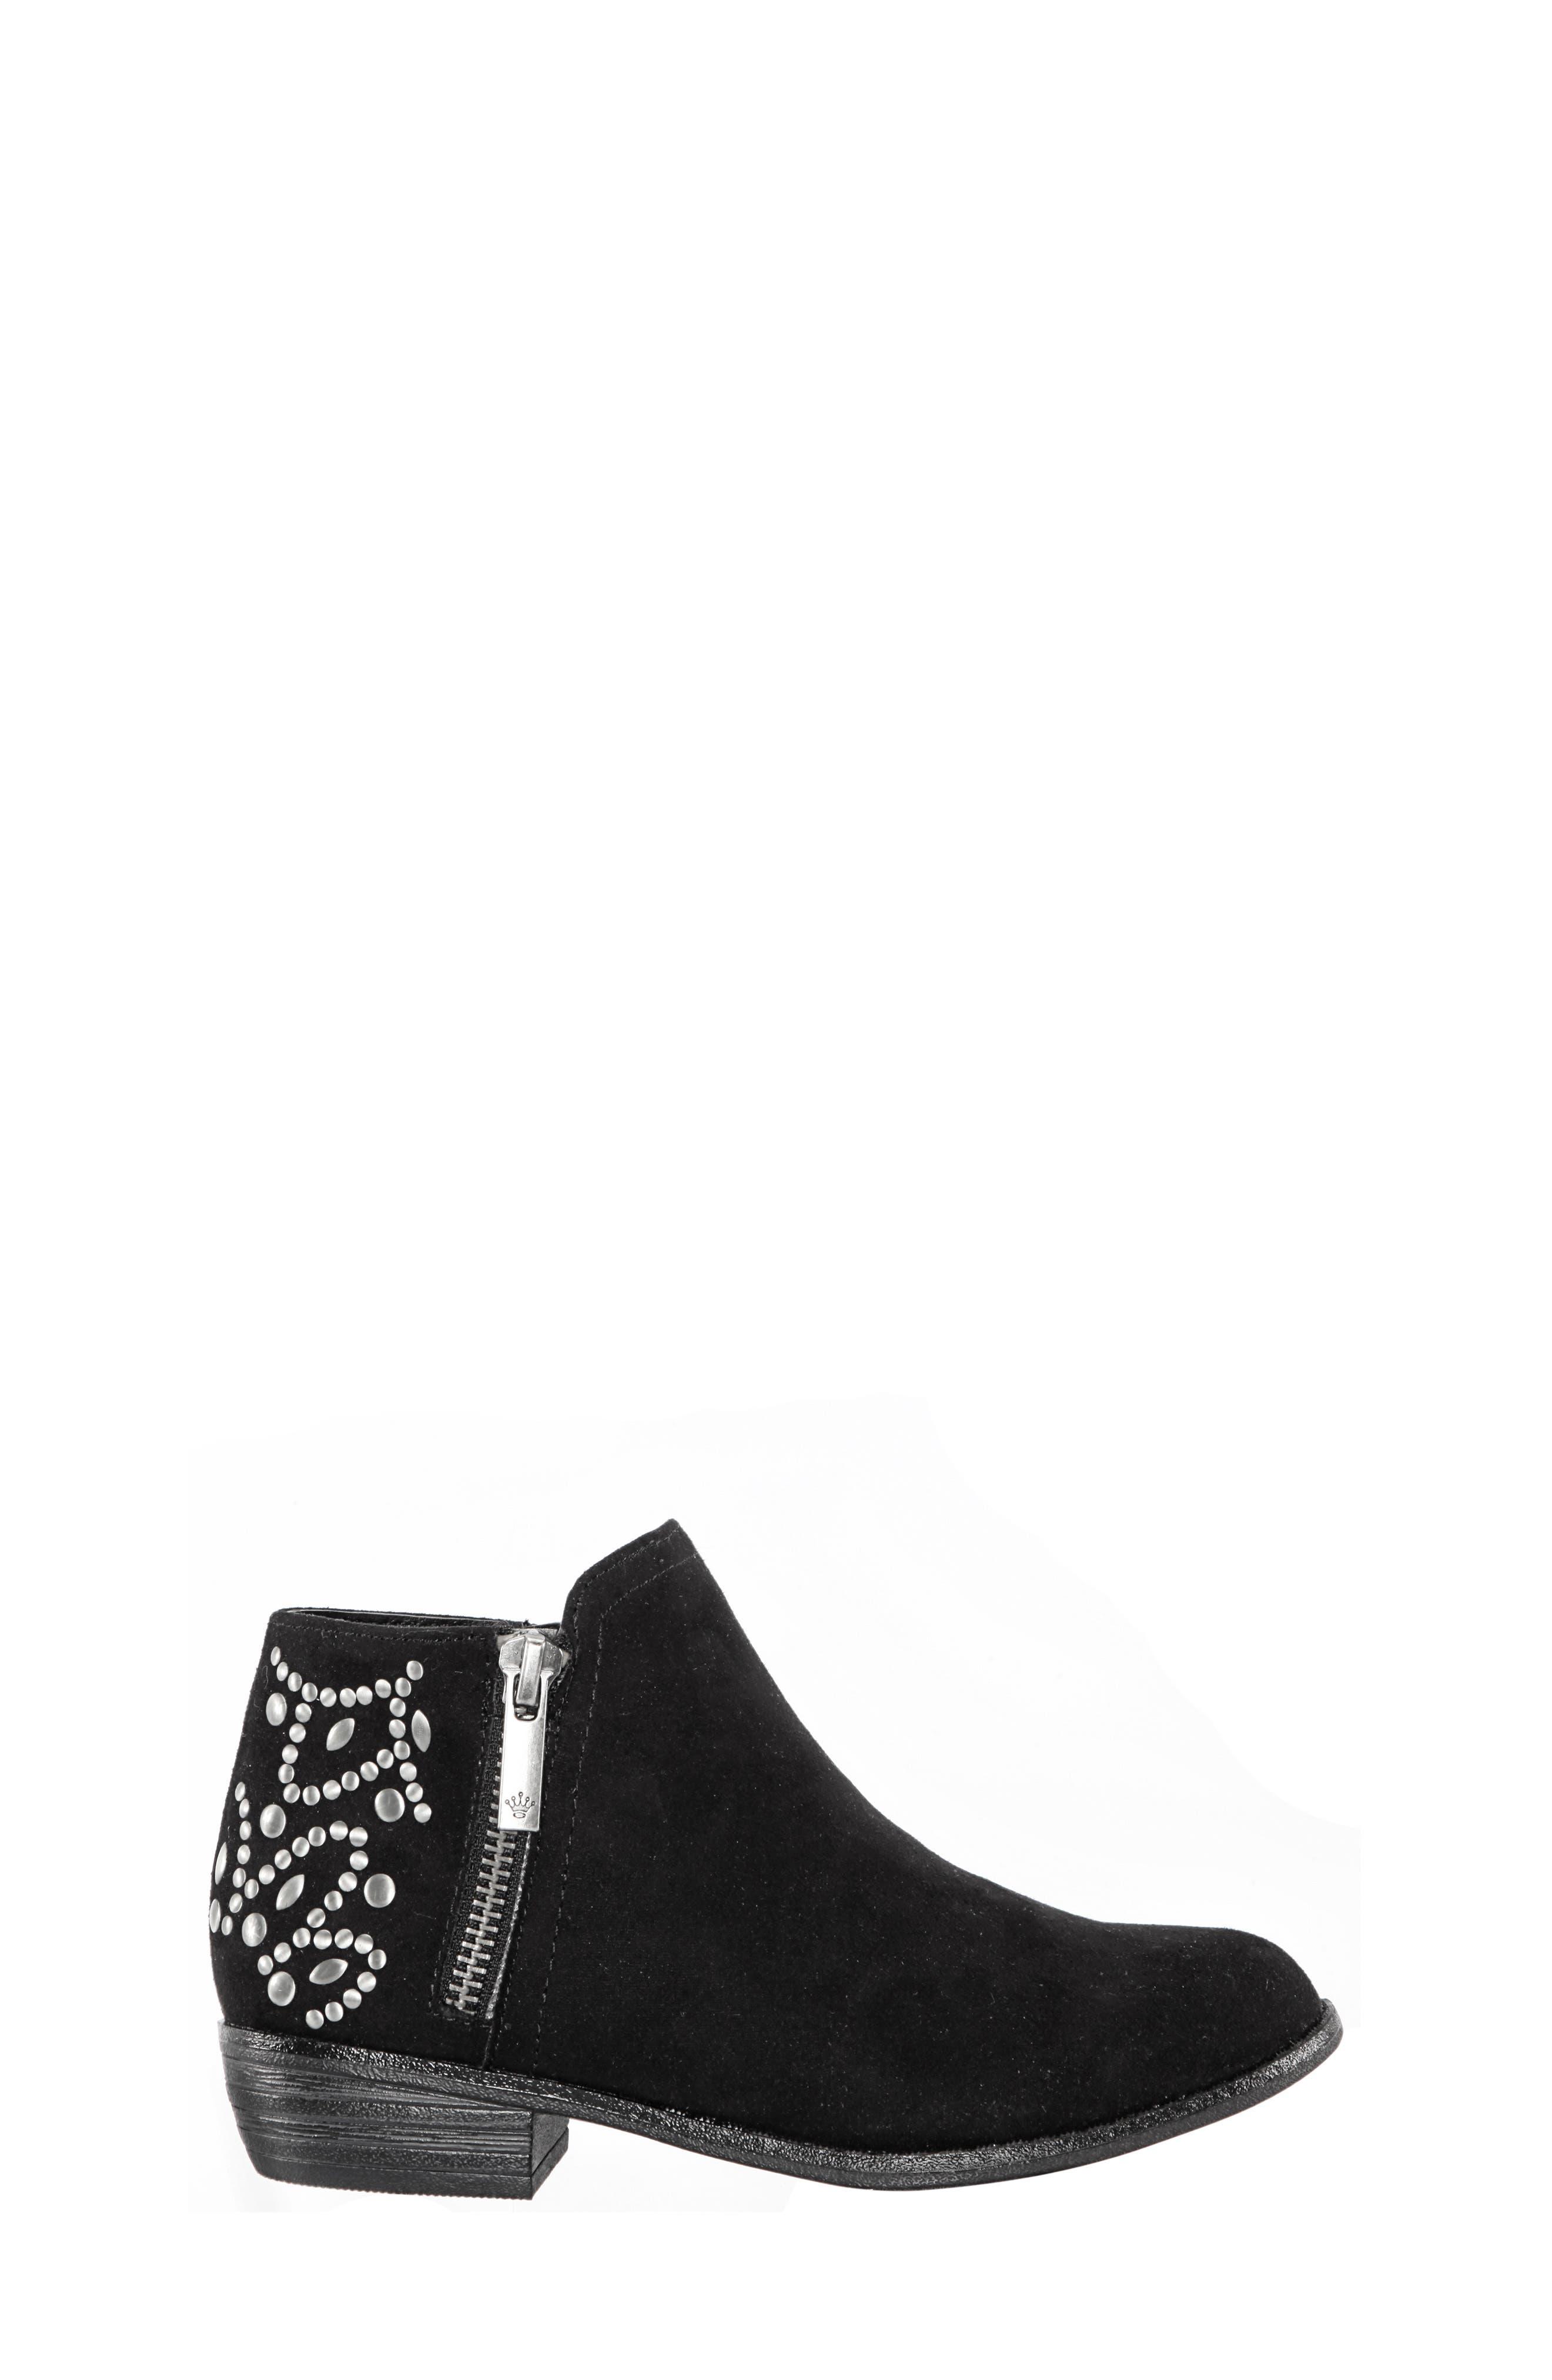 Destany Block Heel Bootie,                             Alternate thumbnail 3, color,                             BLACK MICRO SUEDE